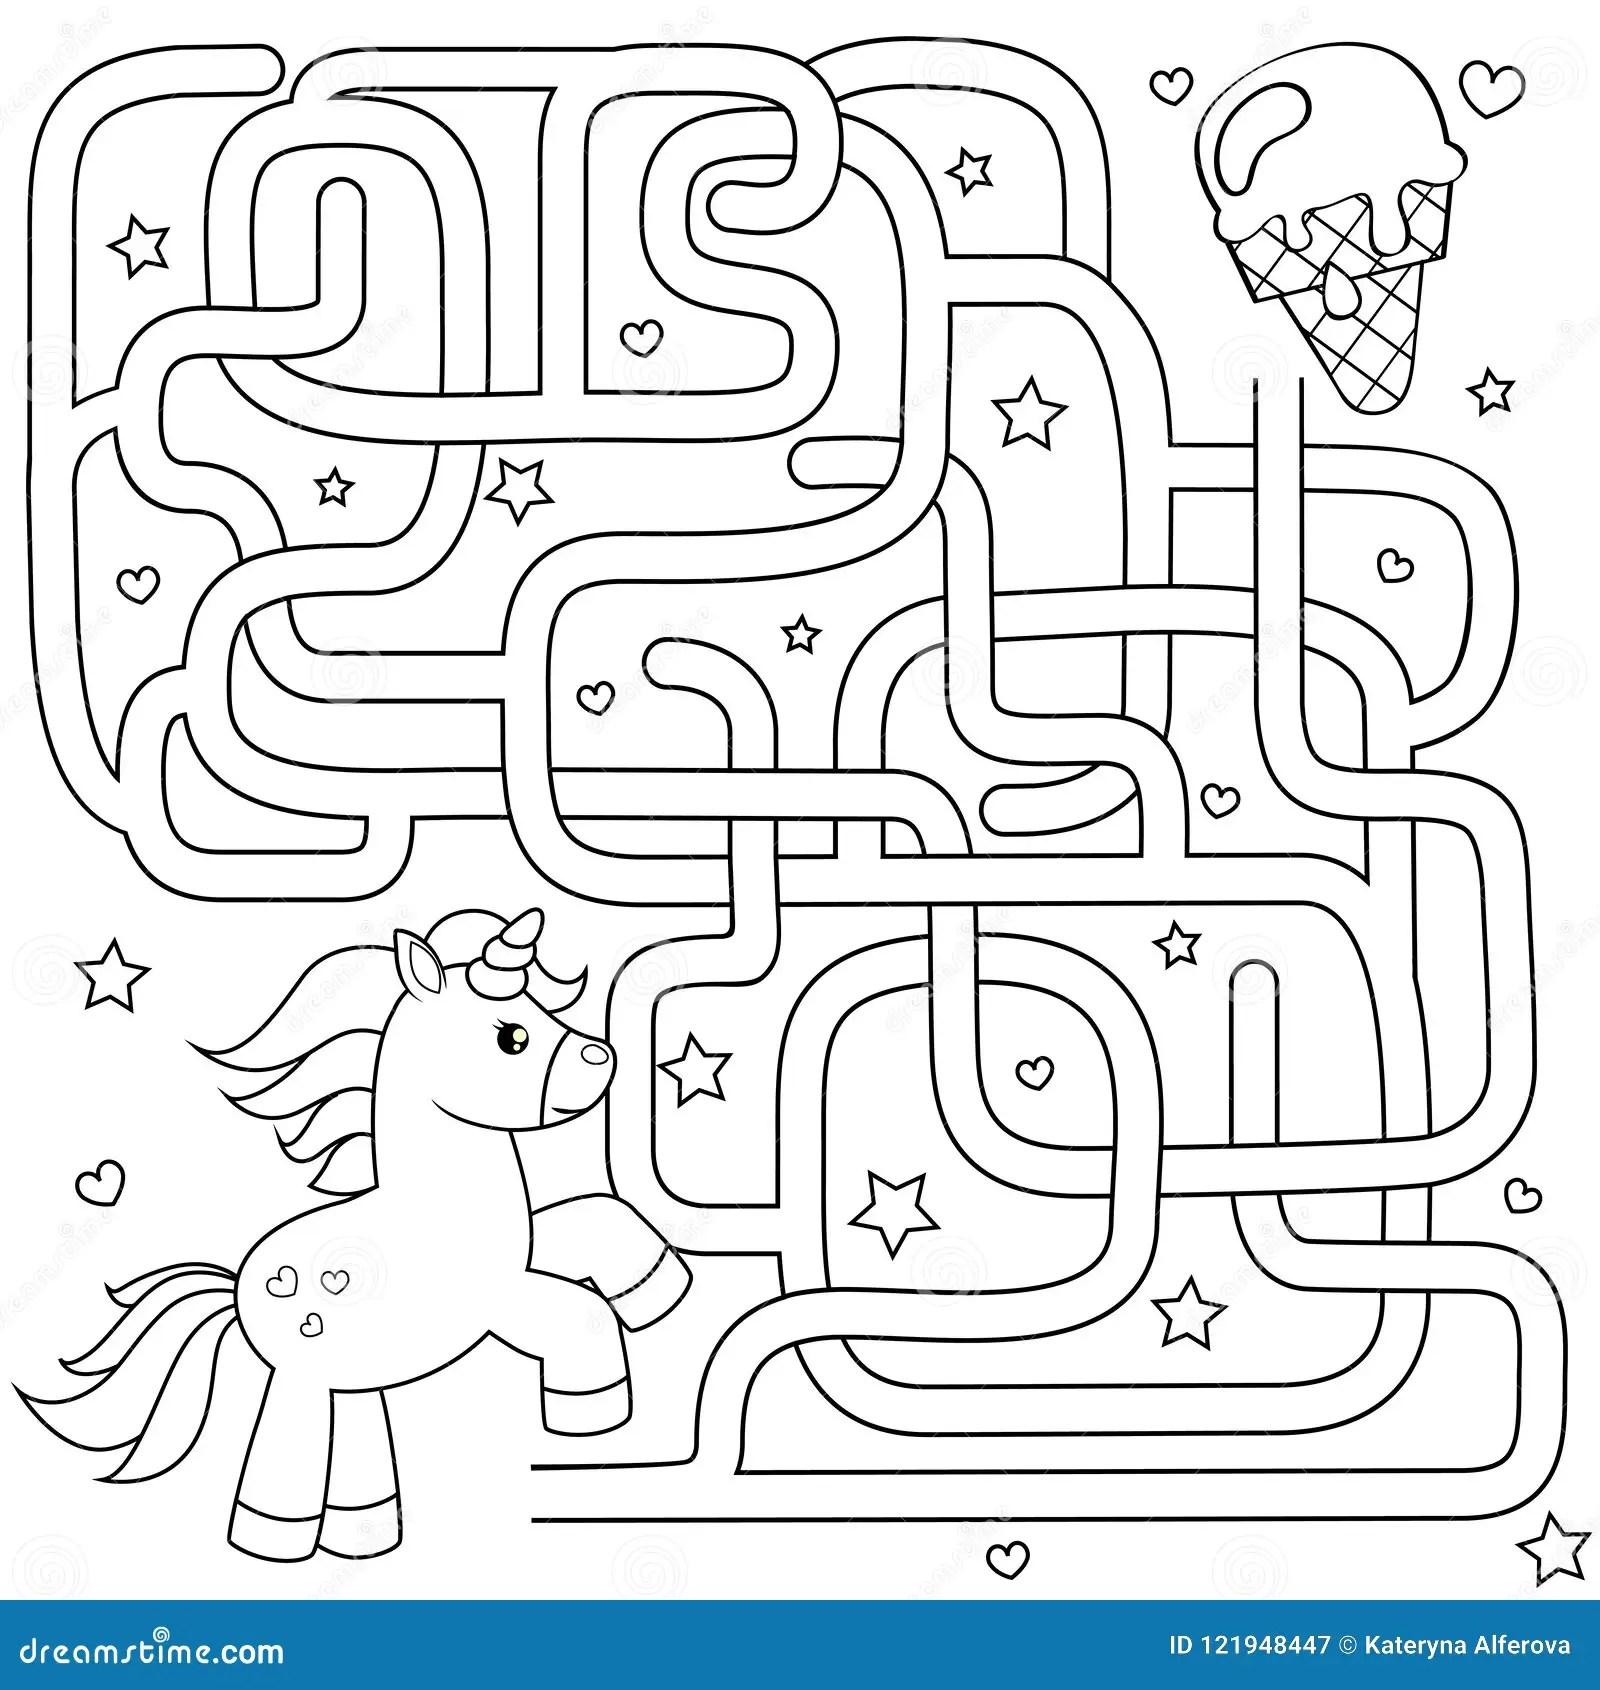 Help Unicorn Find Path To Ice Cream Labyrinth Maze Game